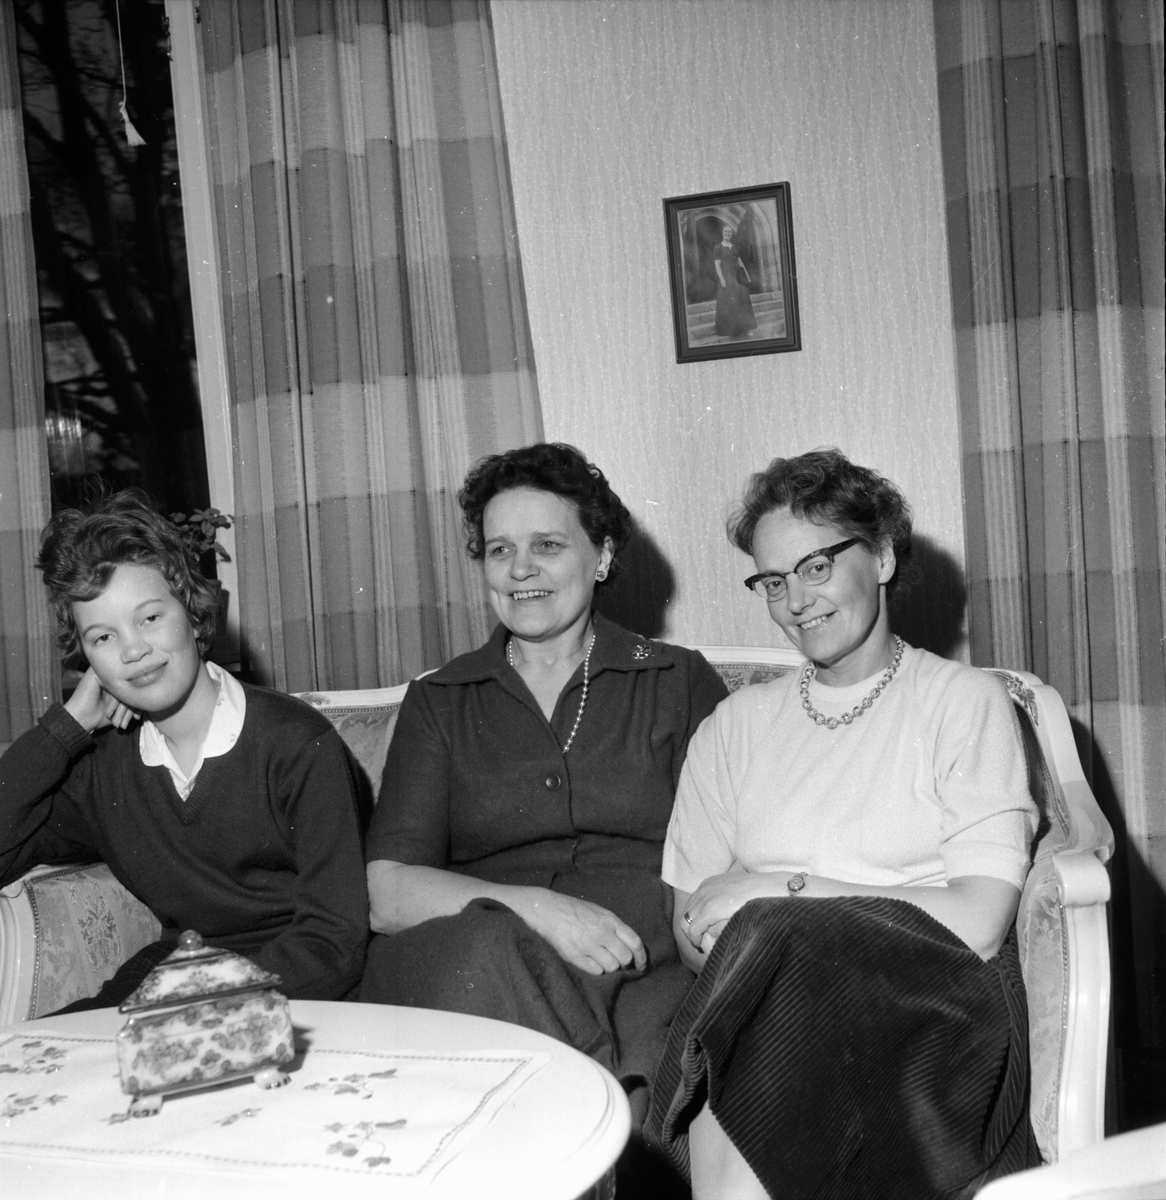 Kantor E. Nilsson, kyrkvärd Margit. Hälsingmo 10/1 1960